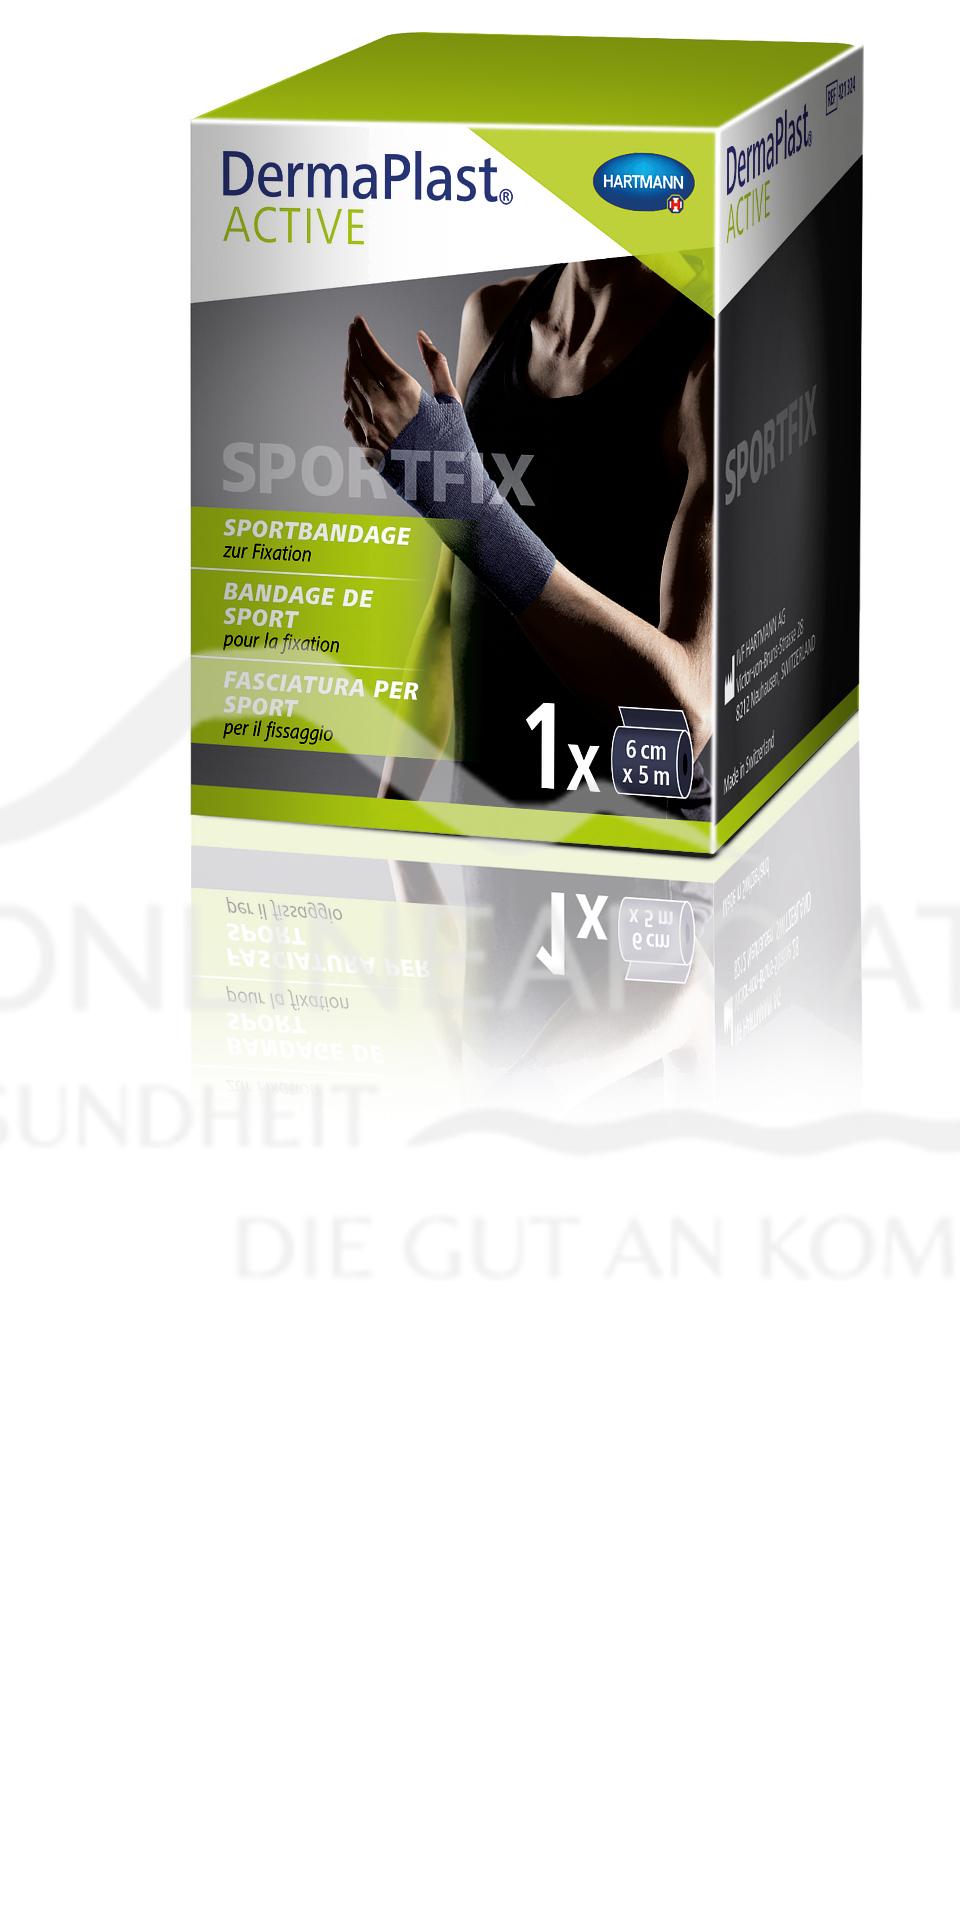 DermaPlast® ACTIVE Sportfix 6cm x 5m